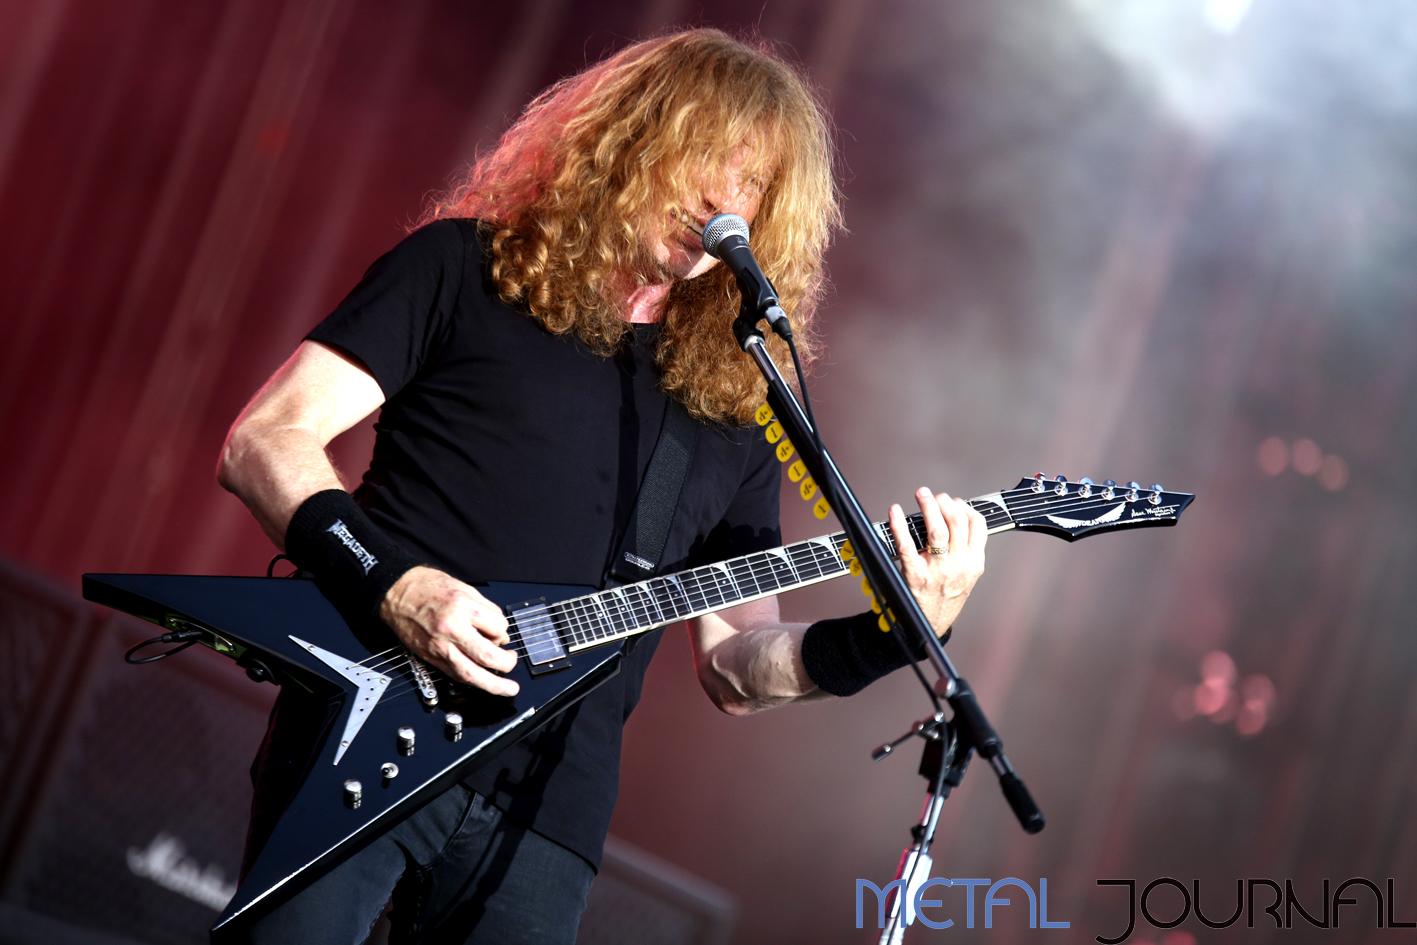 megadeth rock fest 18 - metal journal pic 5